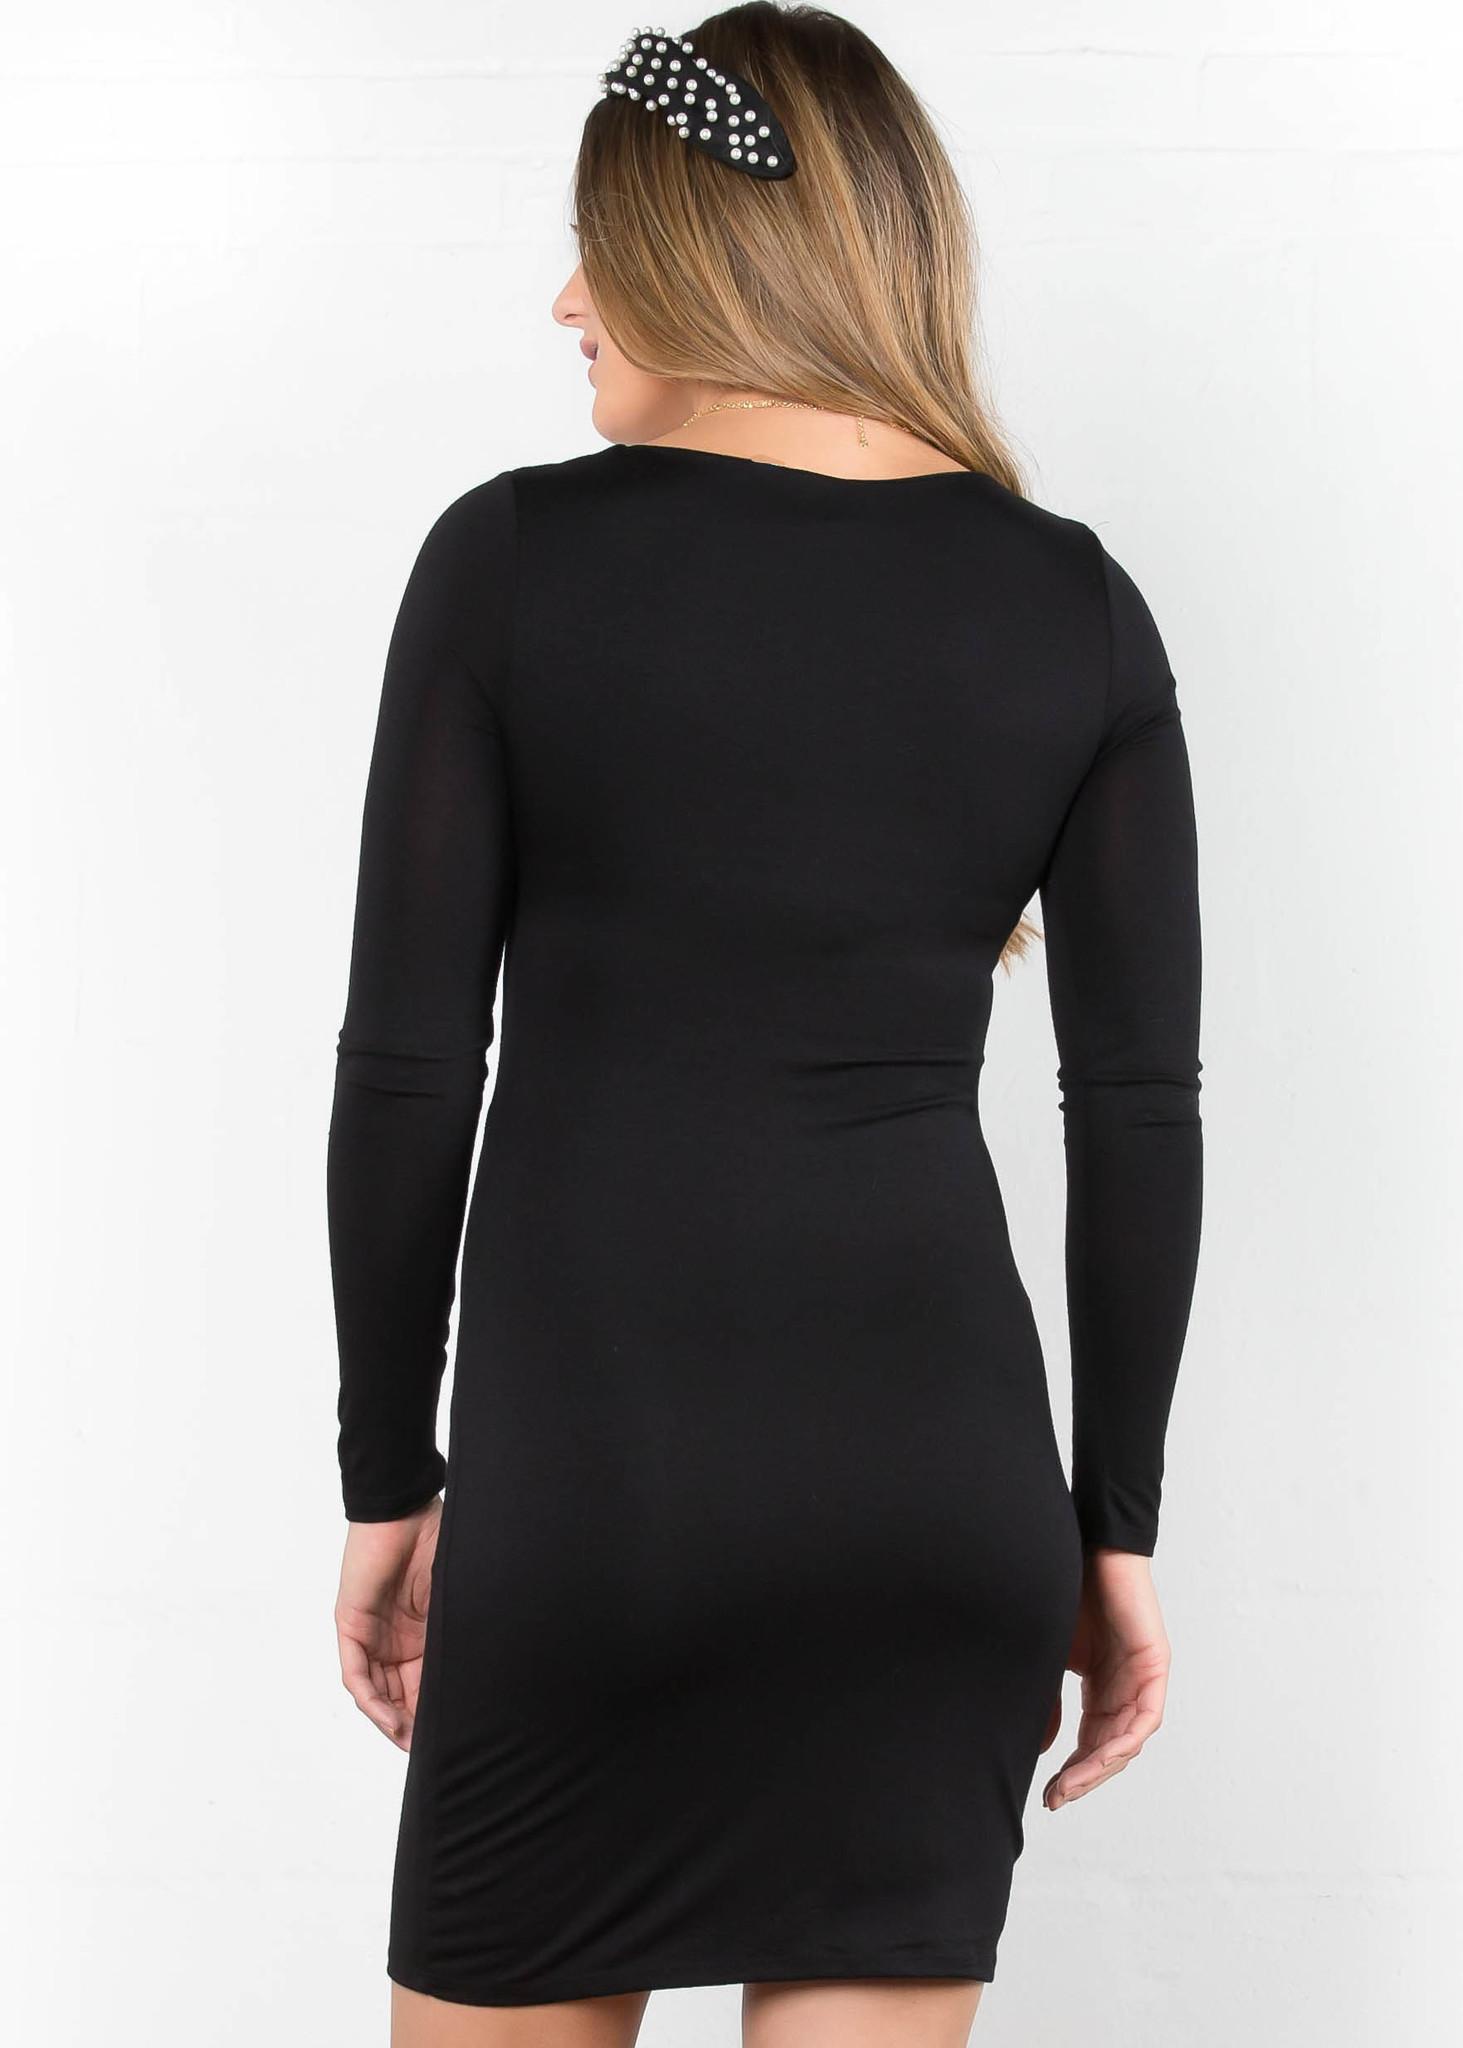 PERFECT TEN BODYCON DRESS